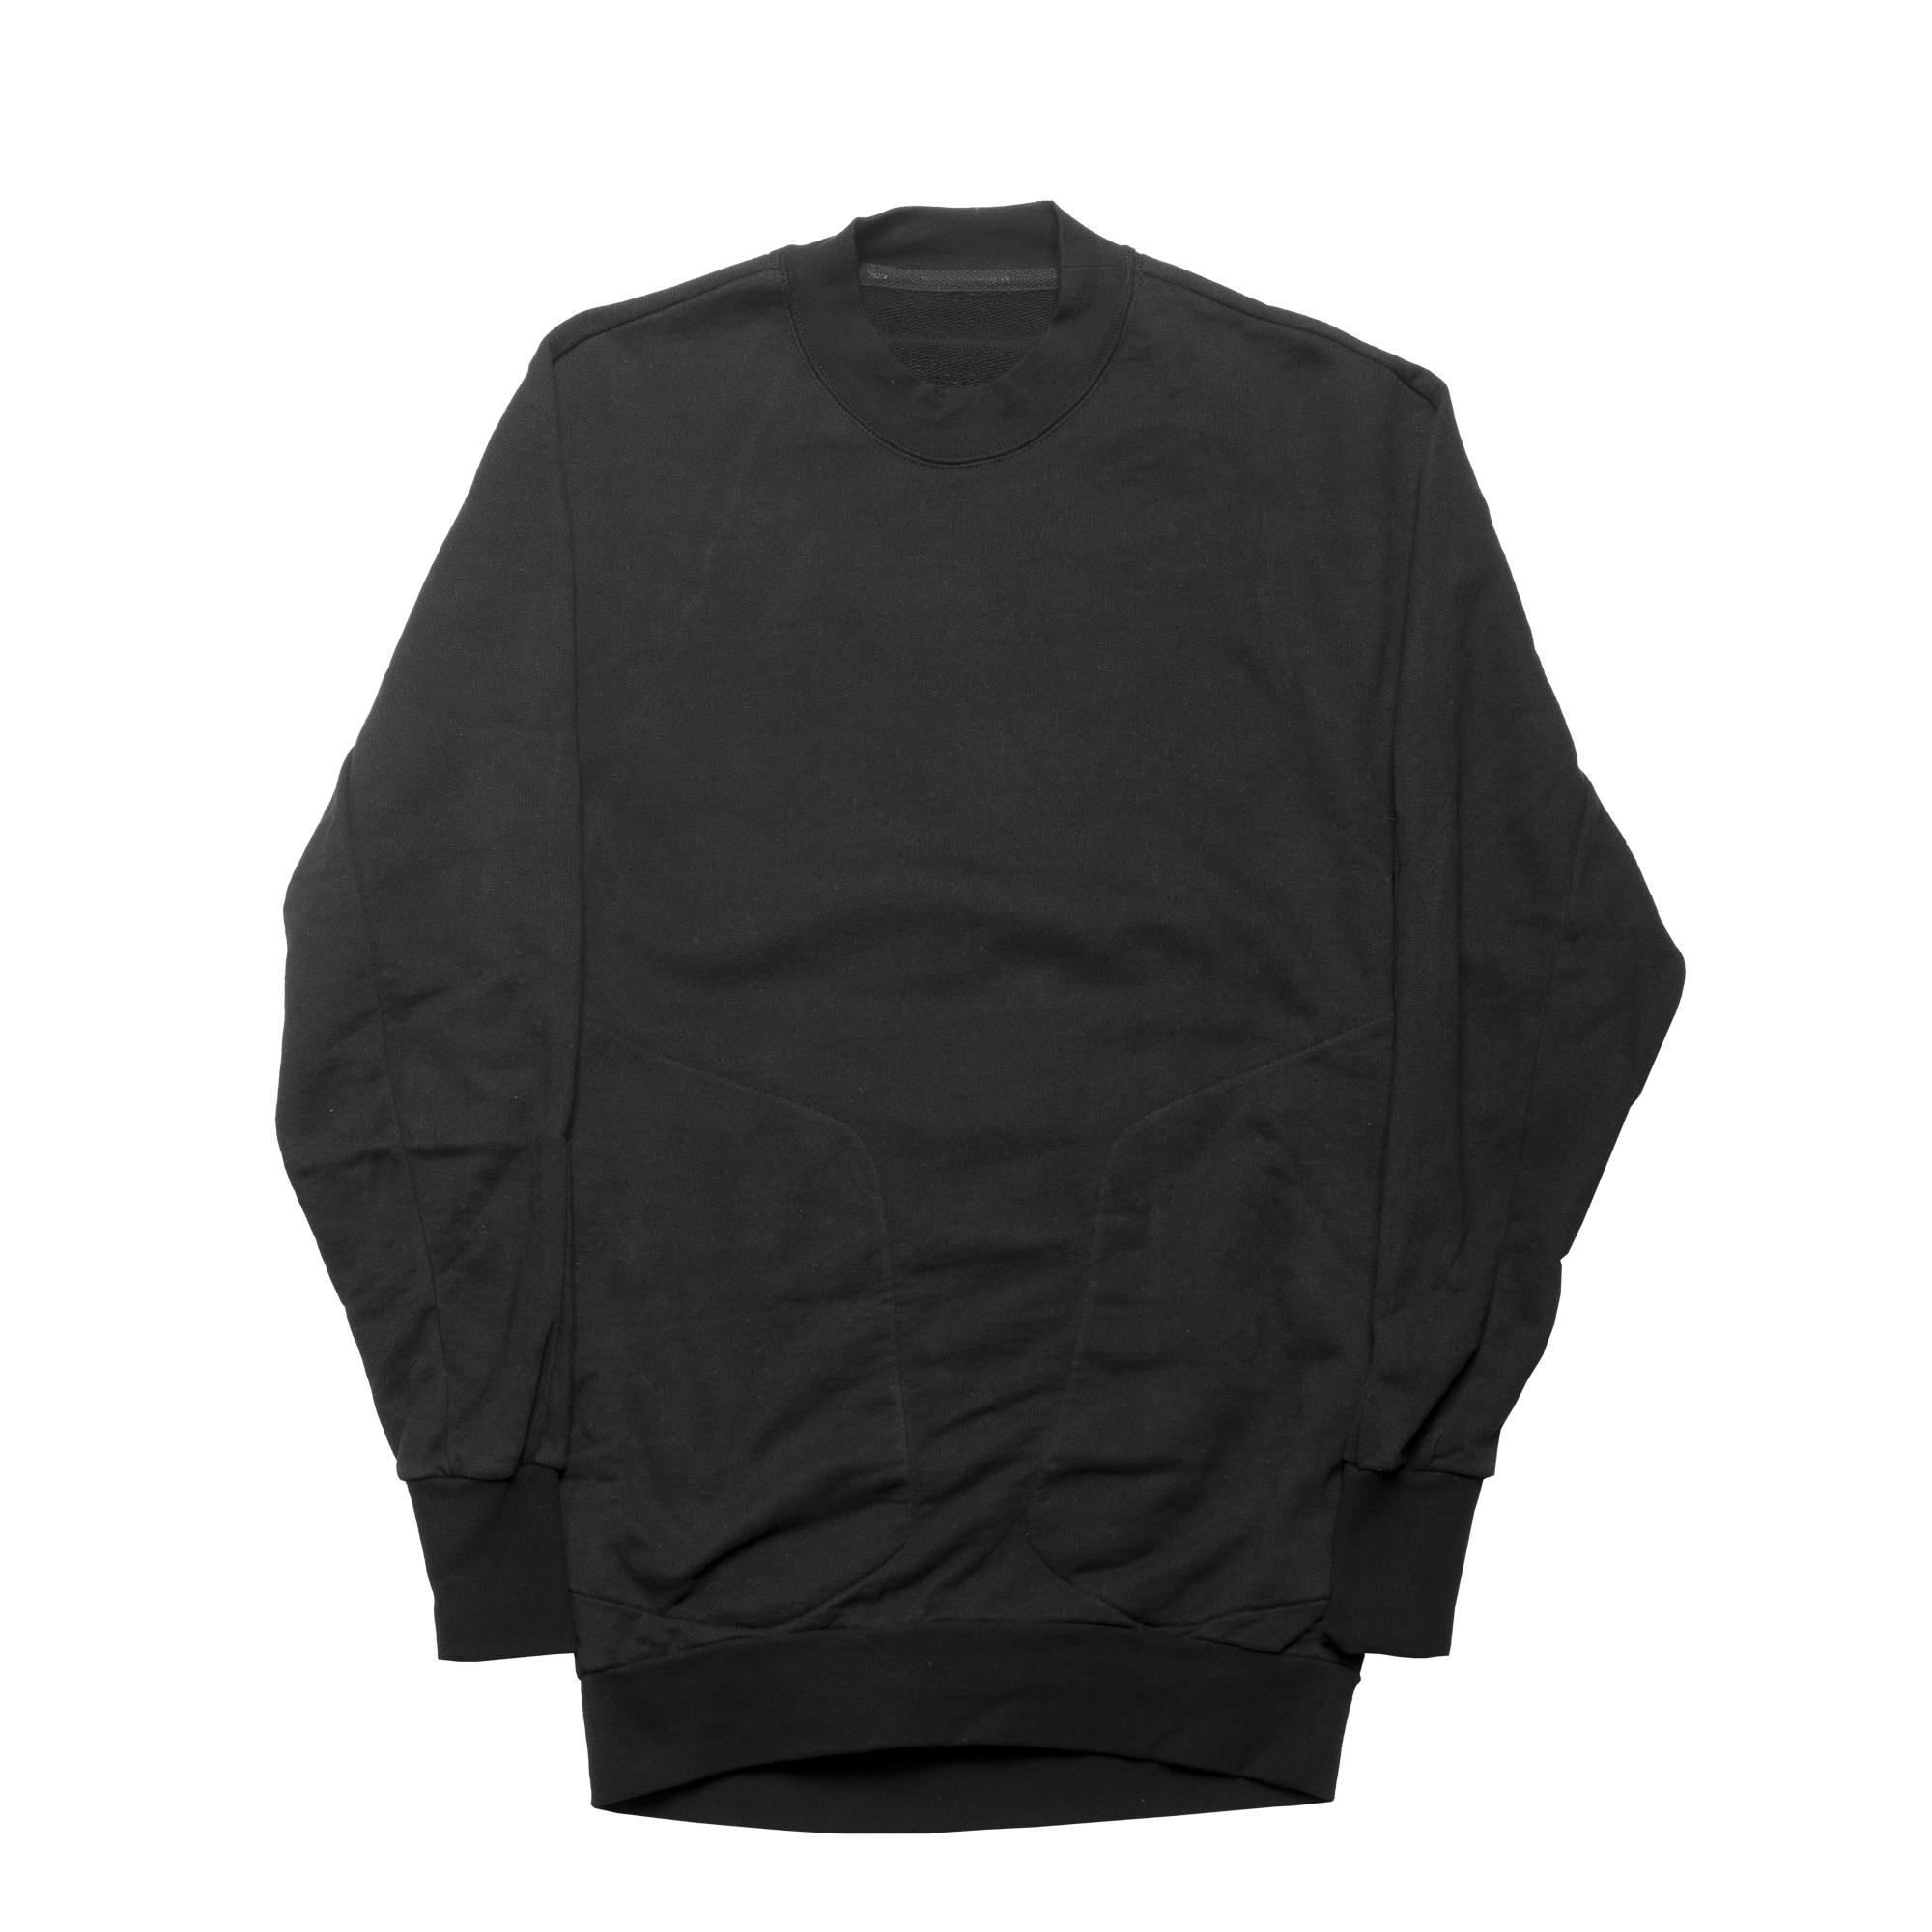 677CUM3-BLACK / BIGスウェットシャツジャケット